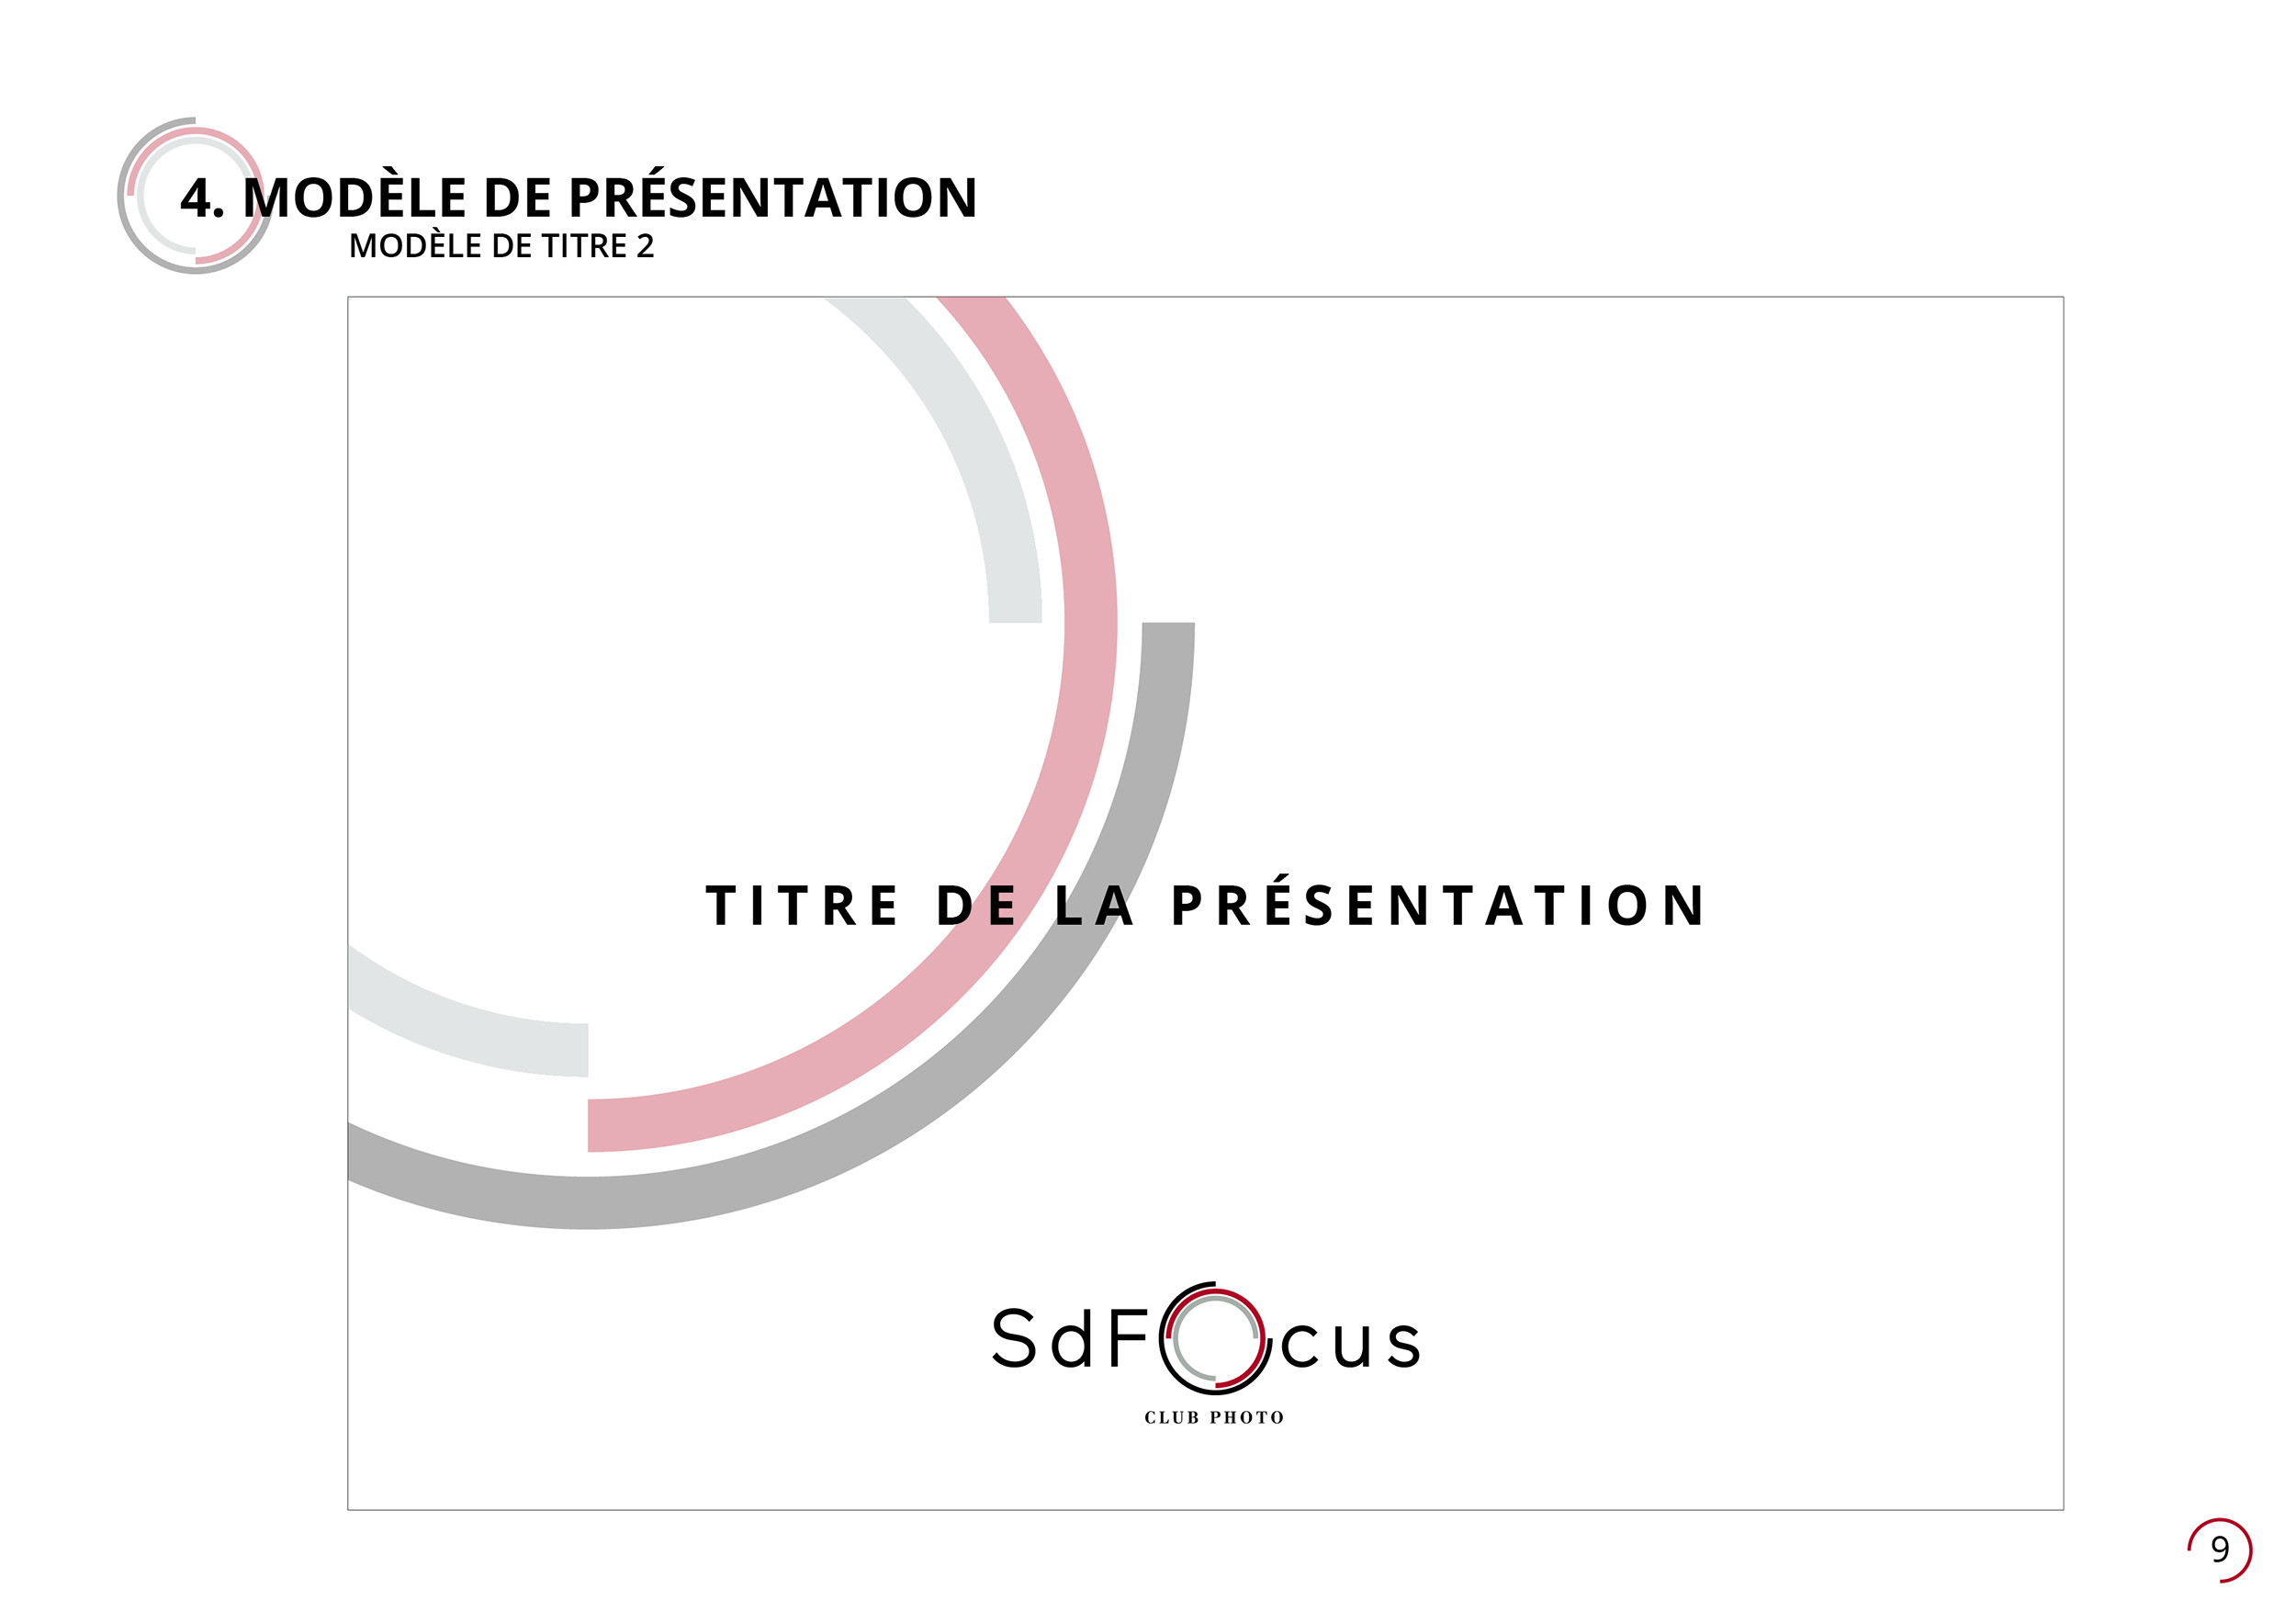 SDFocus_Charte_graphique_202010